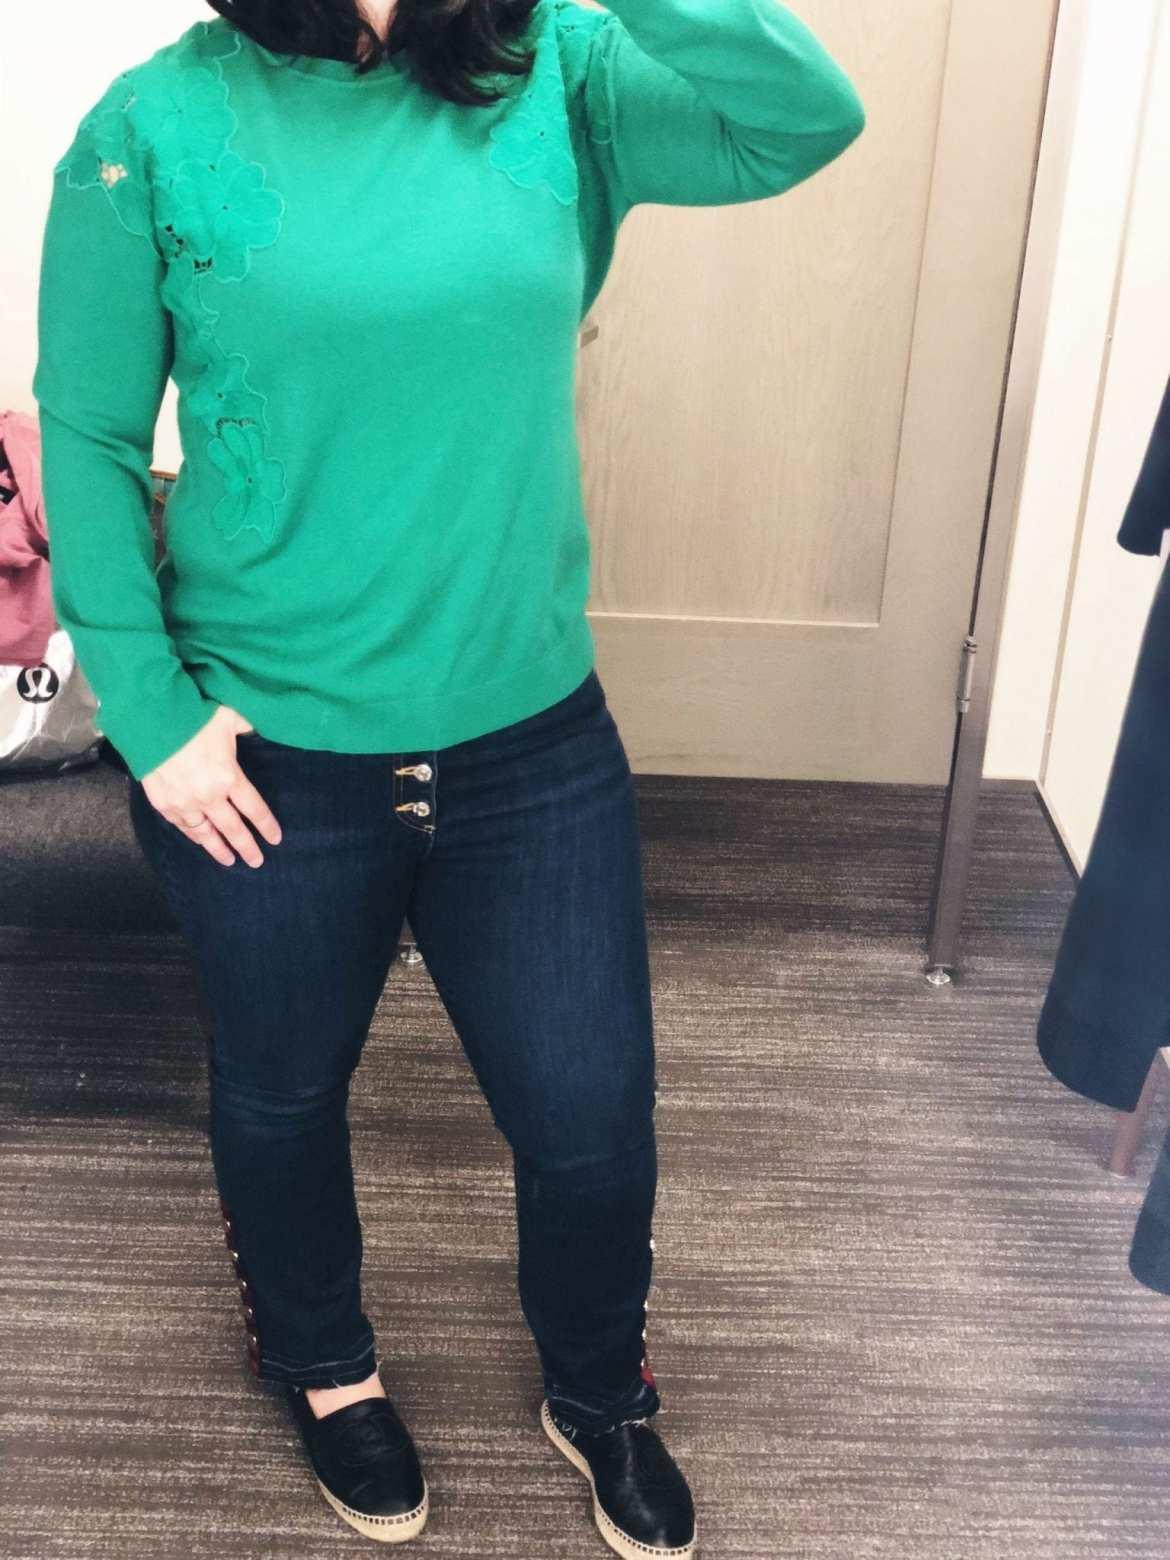 Nordstrom Anniversary Sale 2018 Dressing Room Selfies, Ted Baker Yizelda Sweater, Veronica Beard Jeans